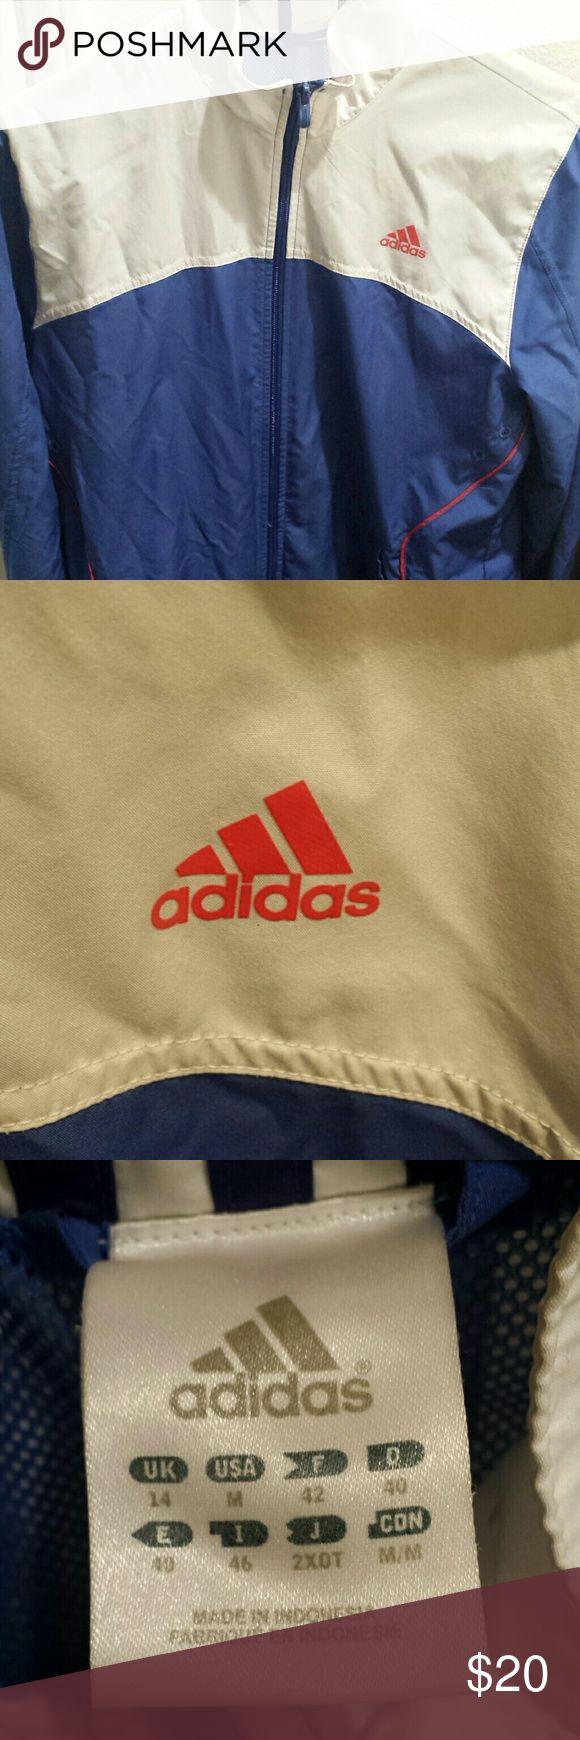 Adidas zip up jacket Blue and white zip up Adidas jacket size medium Adidas Jackets & Coats